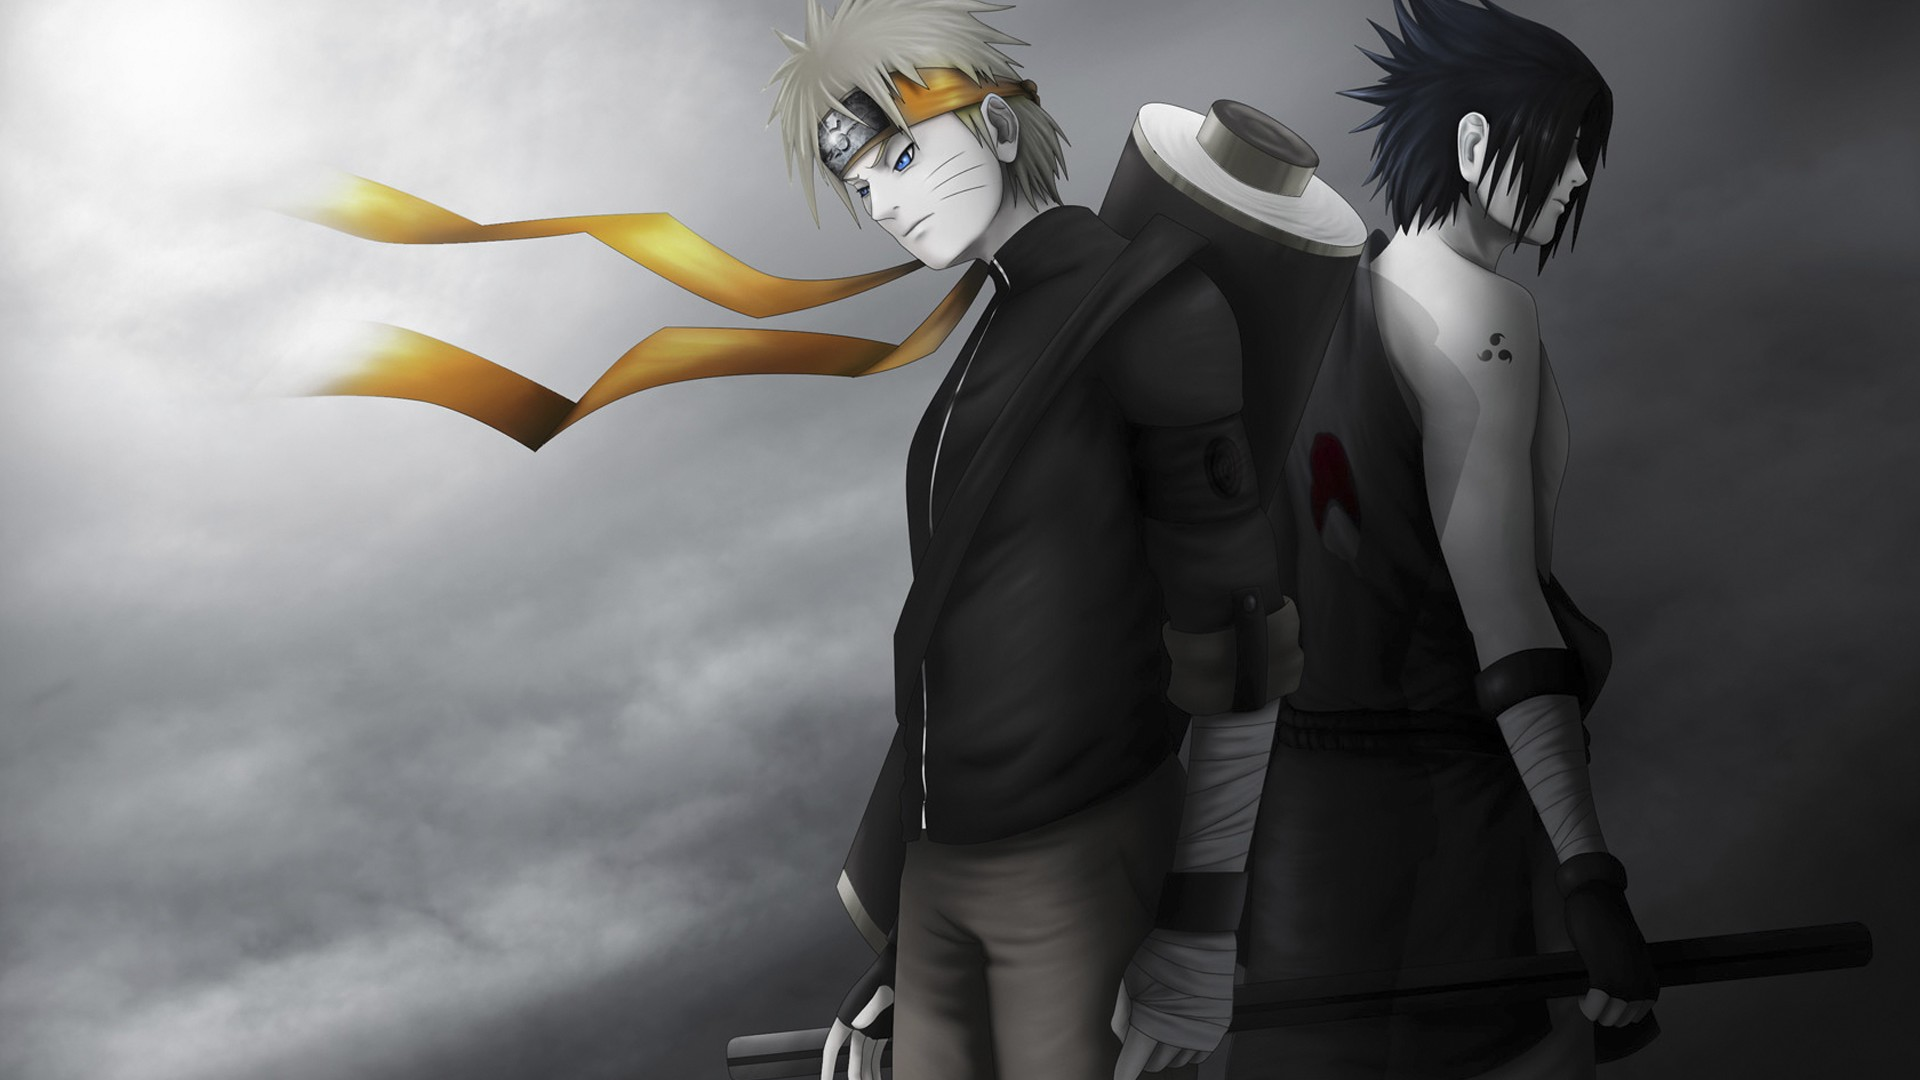 Hot Landscape Wallpaper Hd P Anime Wallpaper Free Hd - Naruto Uzumaki And Sasuke Uchiha - HD Wallpaper